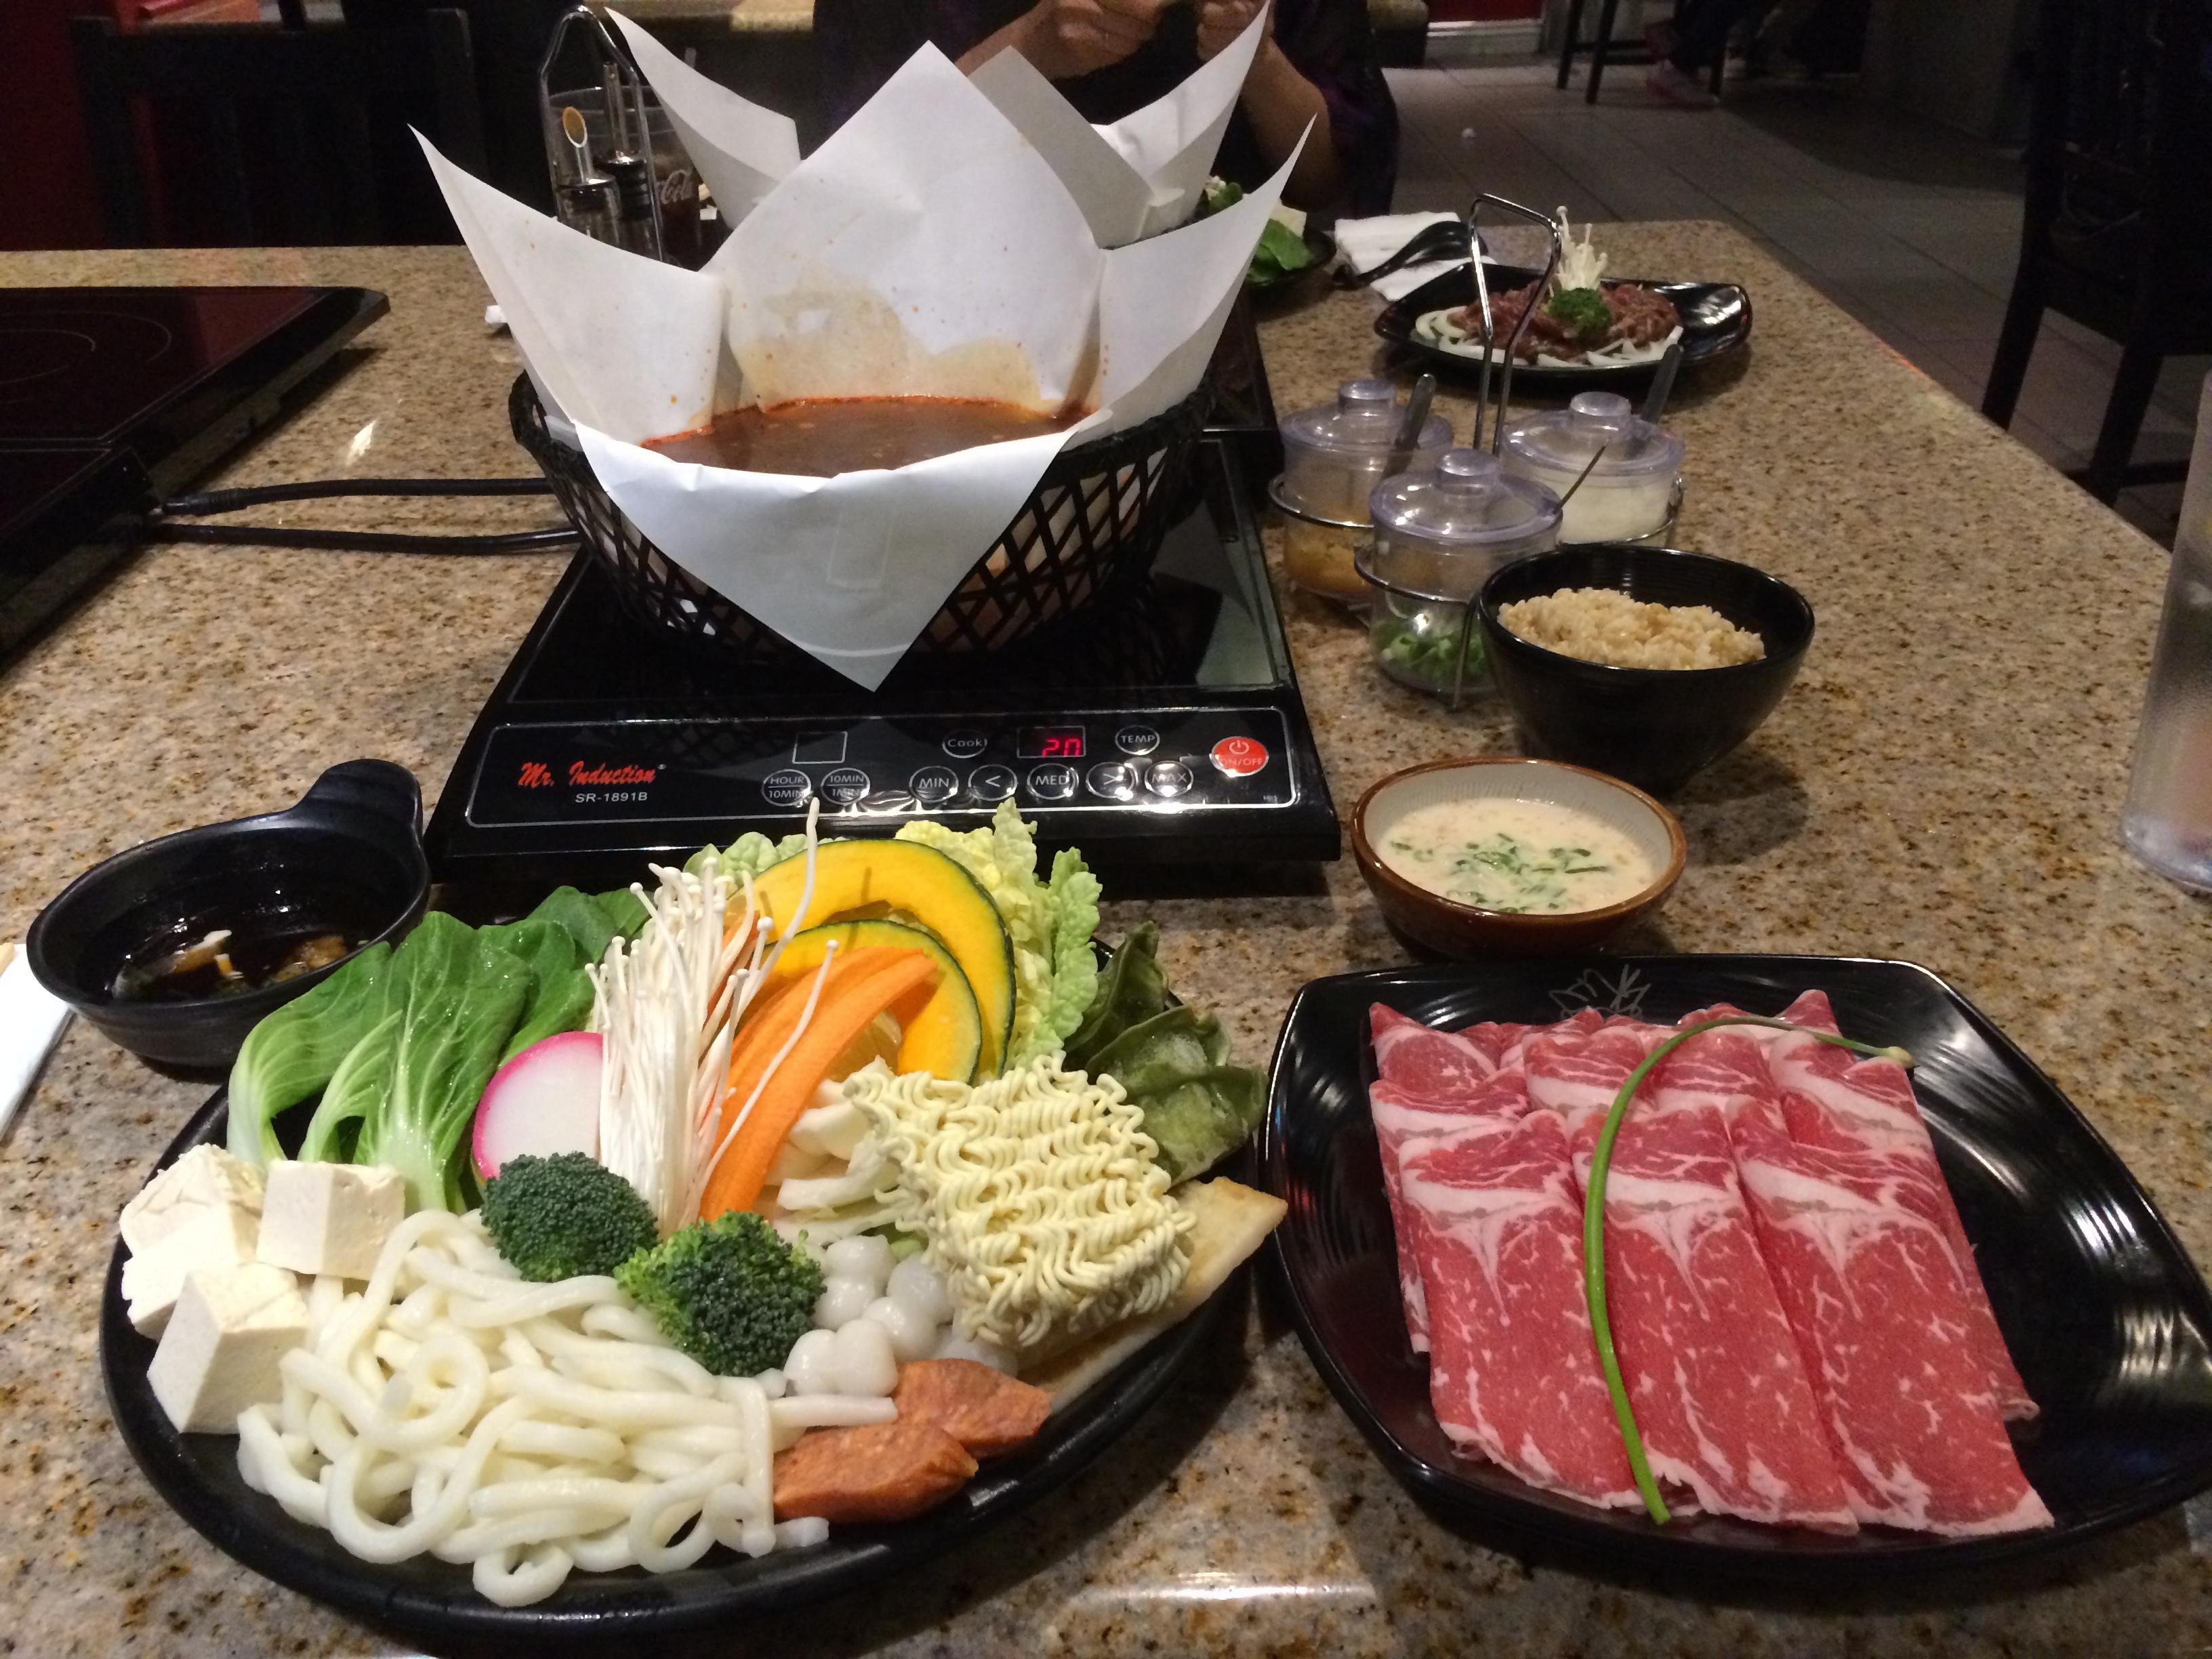 Top 10 shabu shabu hot pot restaurants in orange county for Food bar near me